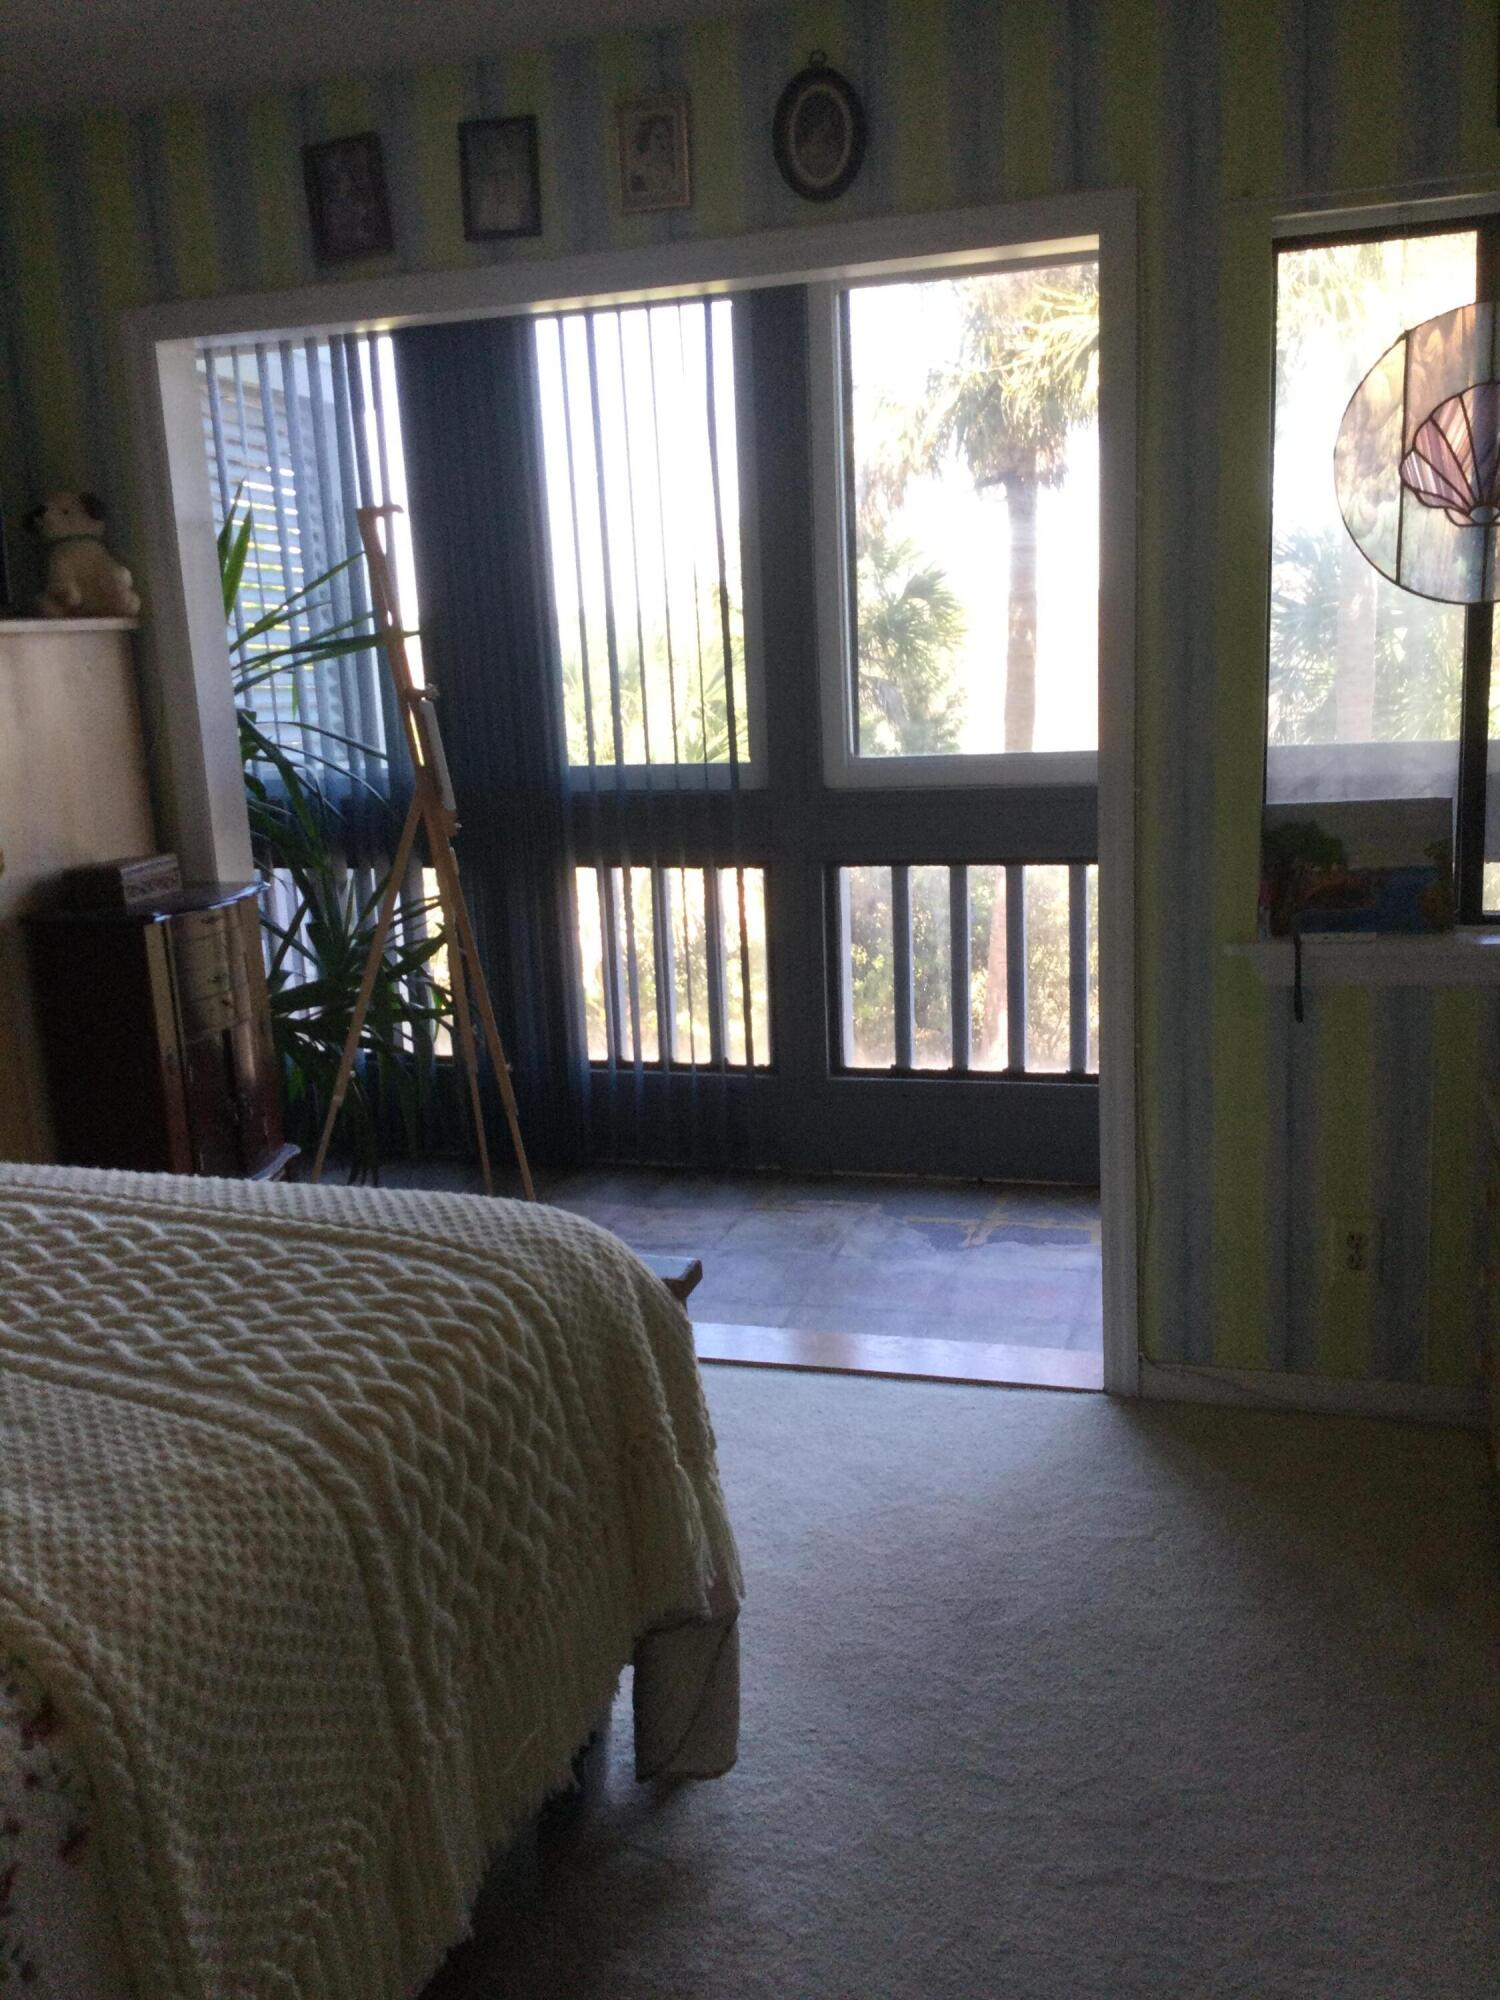 Marshview Villas Homes For Sale - 124 Mariners Cay, Folly Beach, SC - 6